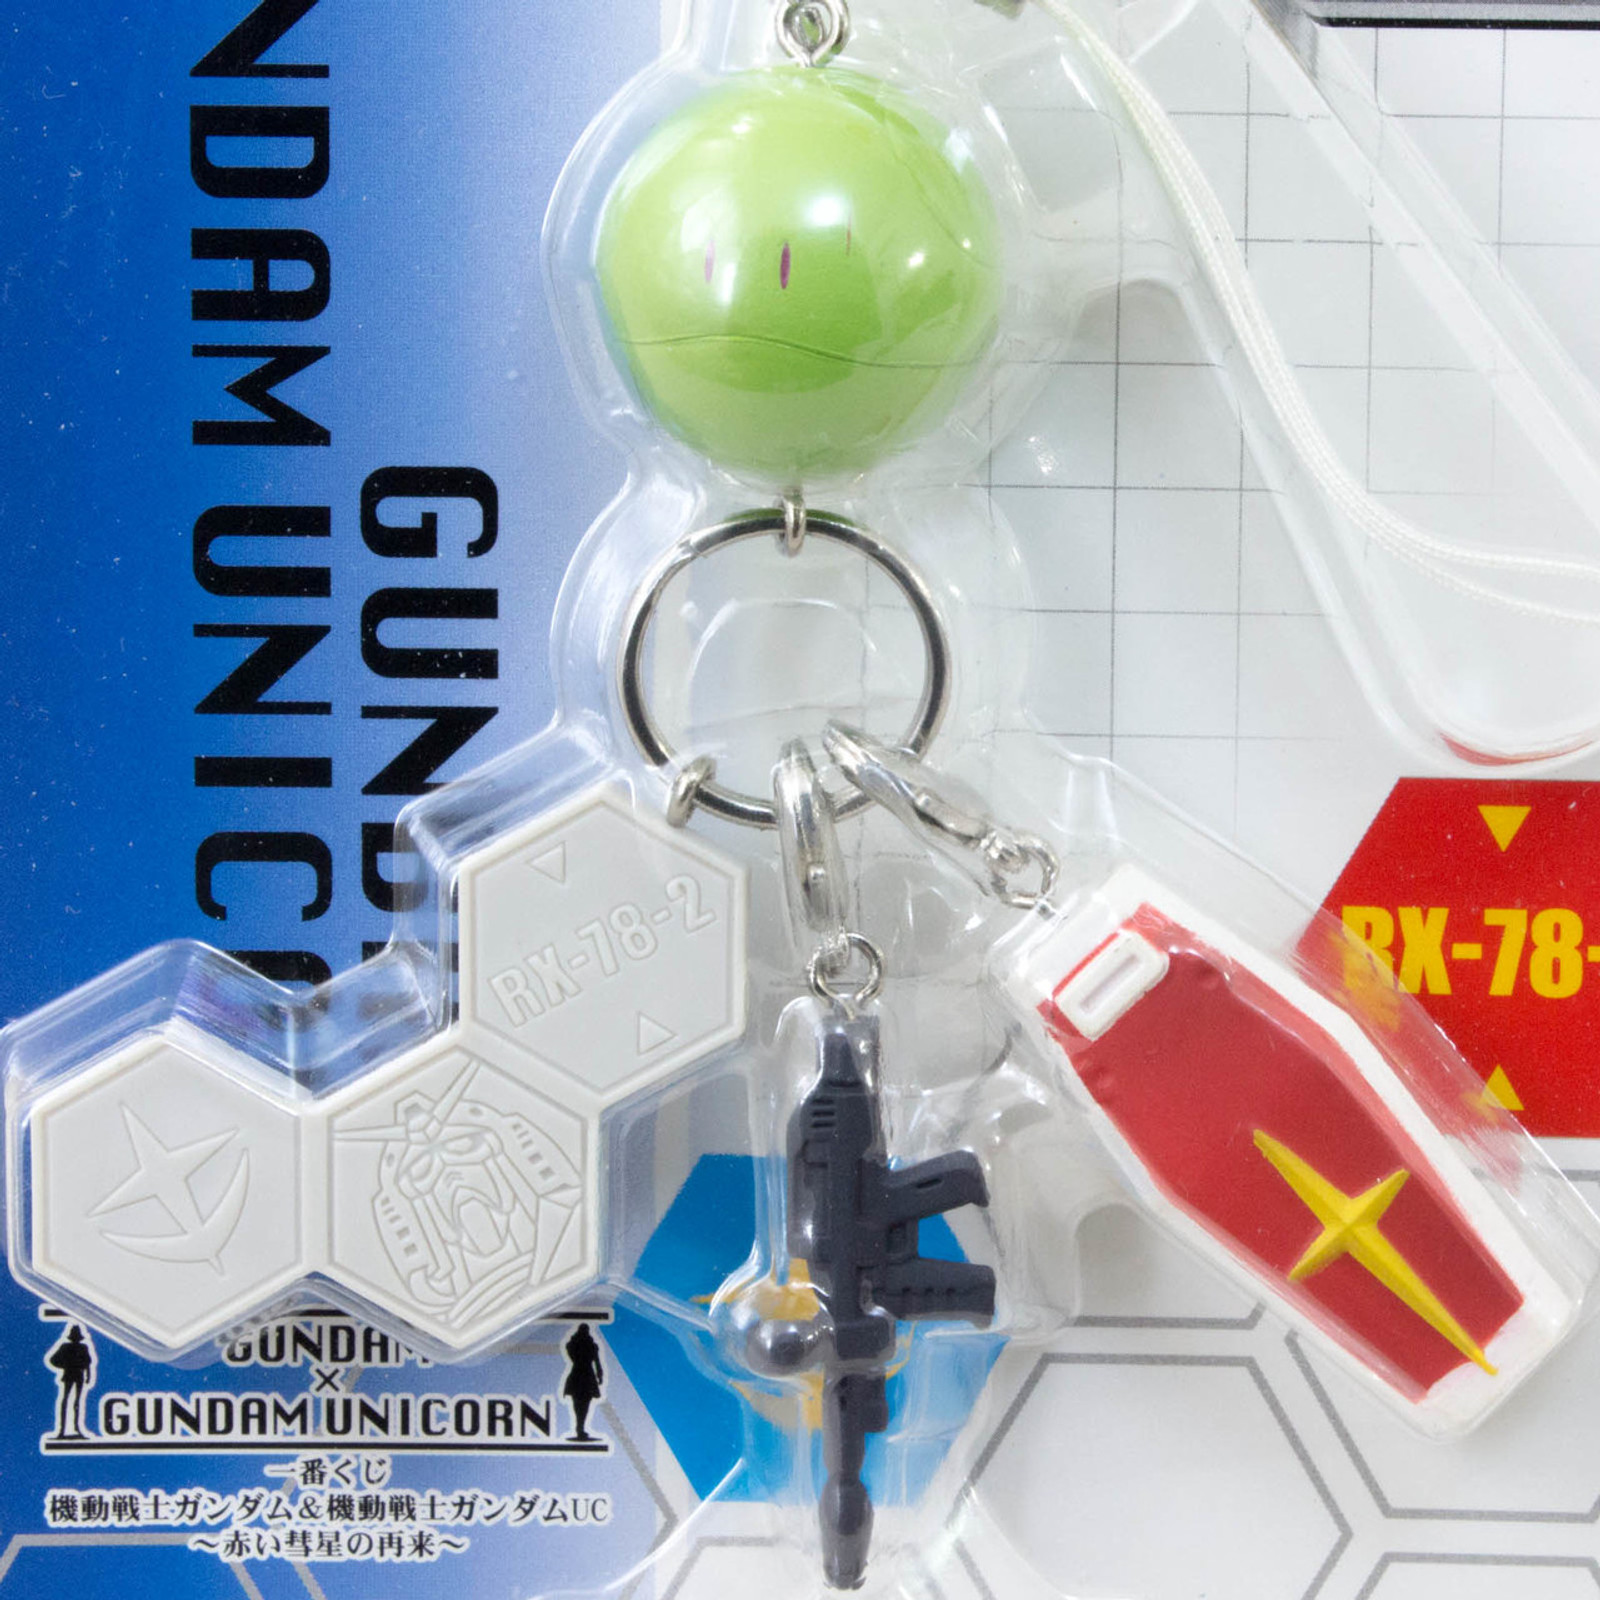 Gundam Mascot Robot Haro + Beam Rifle Figure Mobile Strap 2 JAPAN ANIME MANGA